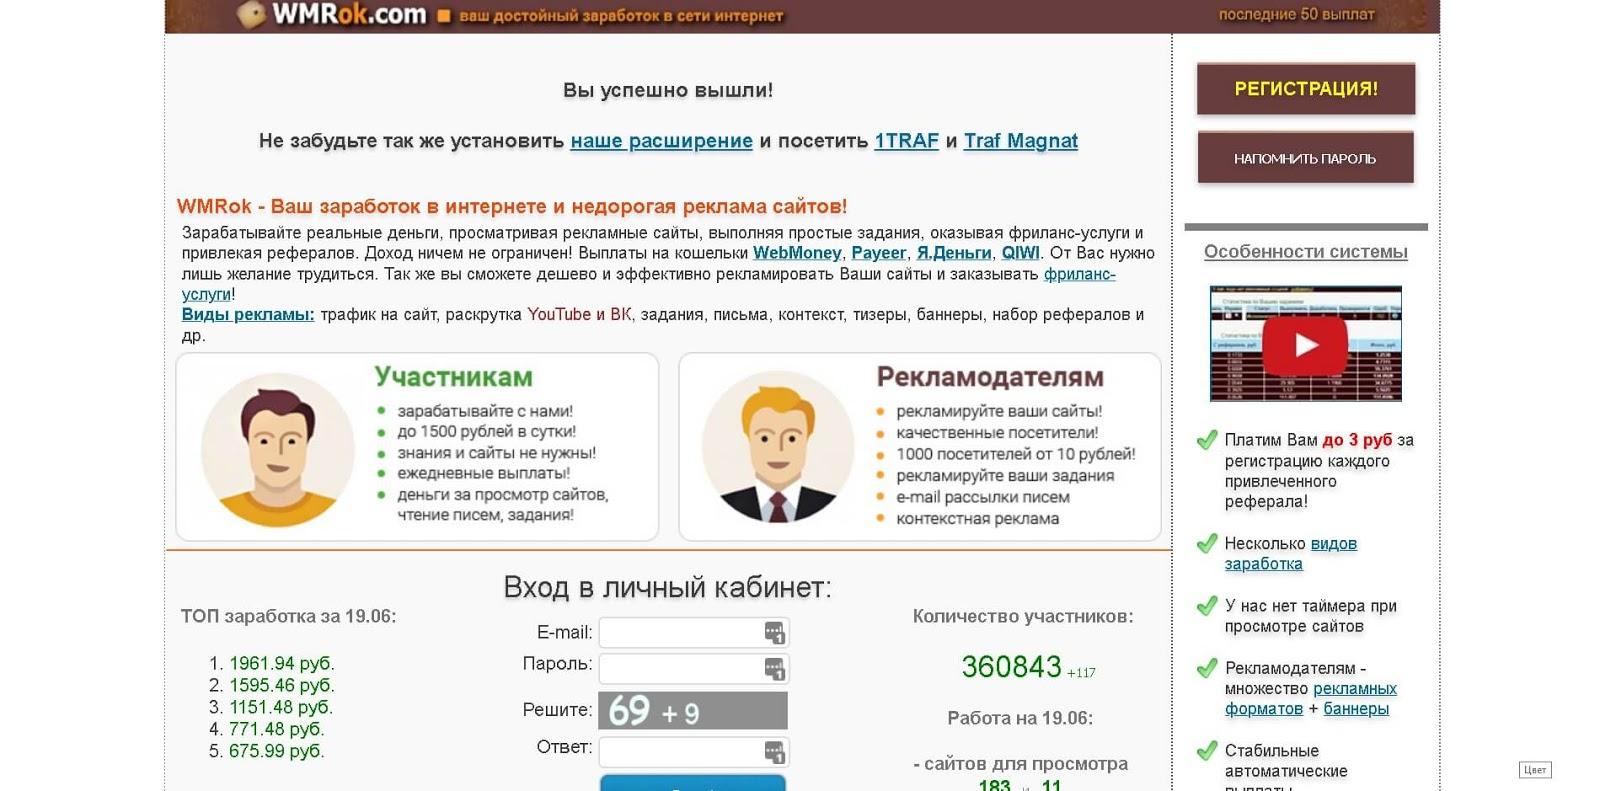 wmrock-glavnaya-stranicza